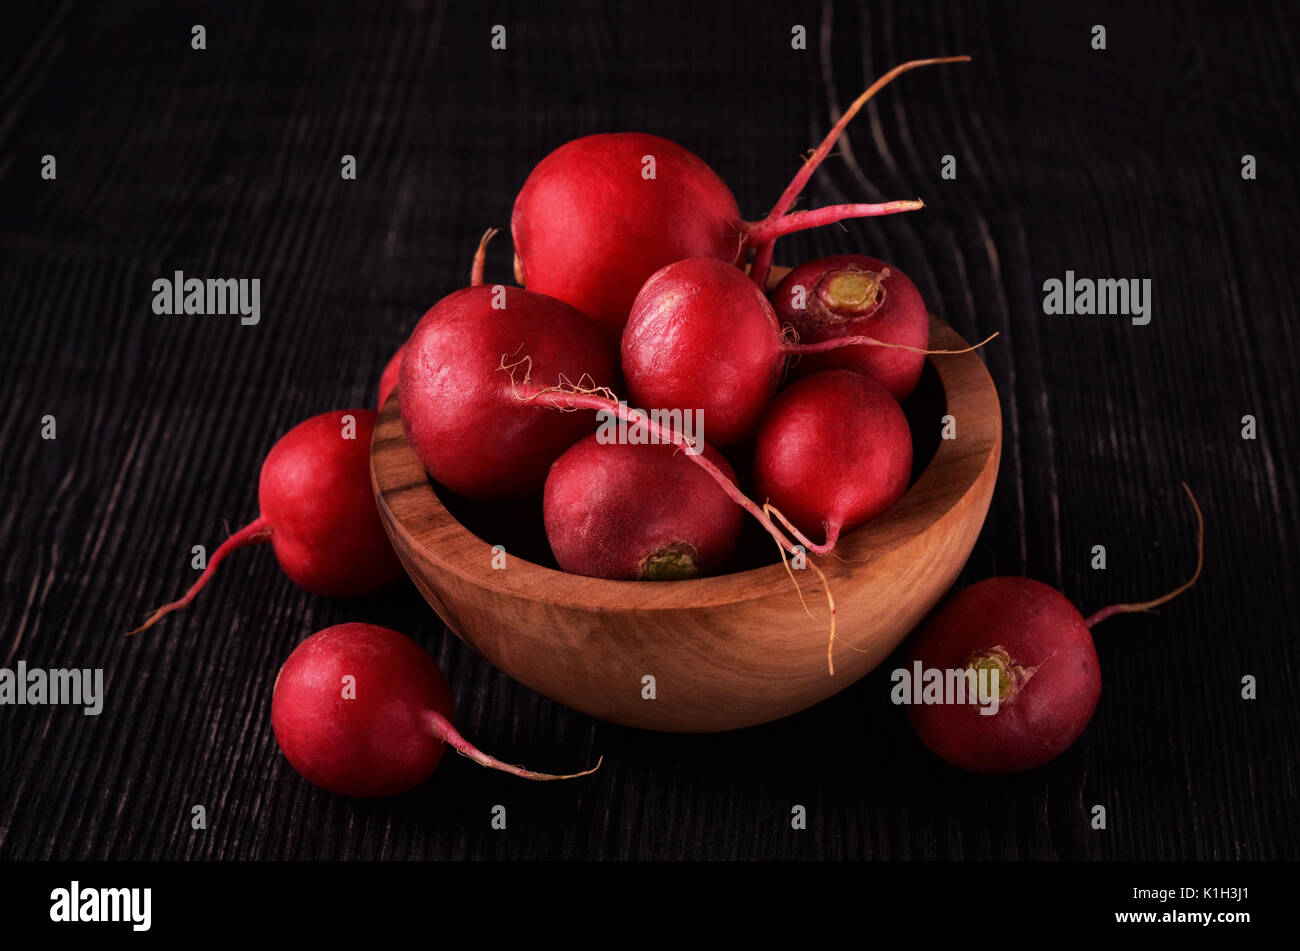 Organic rabano rojo oscuro sobre fondo de madera cuenco de madera Imagen De Stock